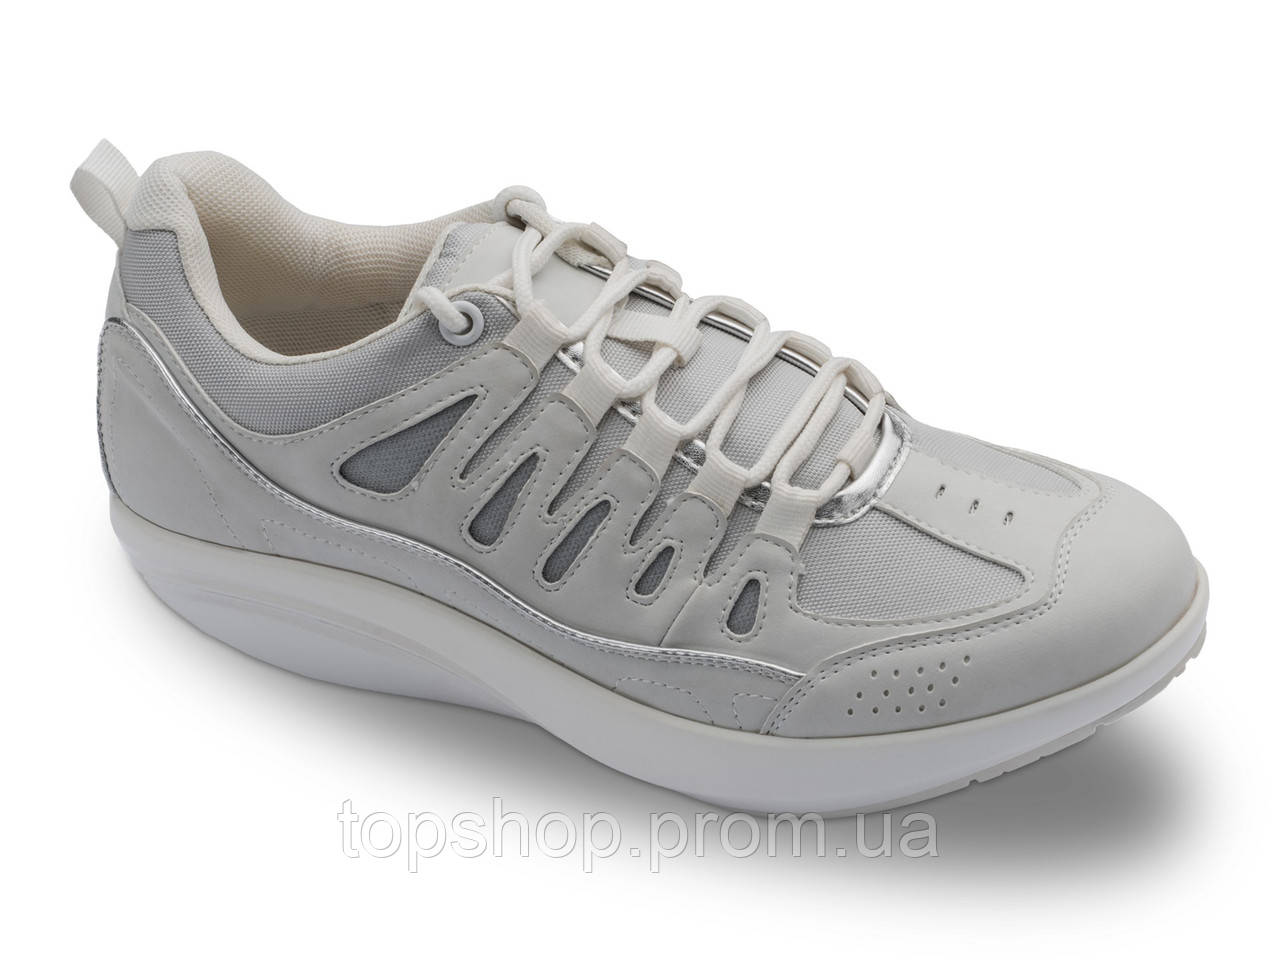 f8a66864d Кроссовки Walkmaxx Fit 2.0 45 Белый — в Категории